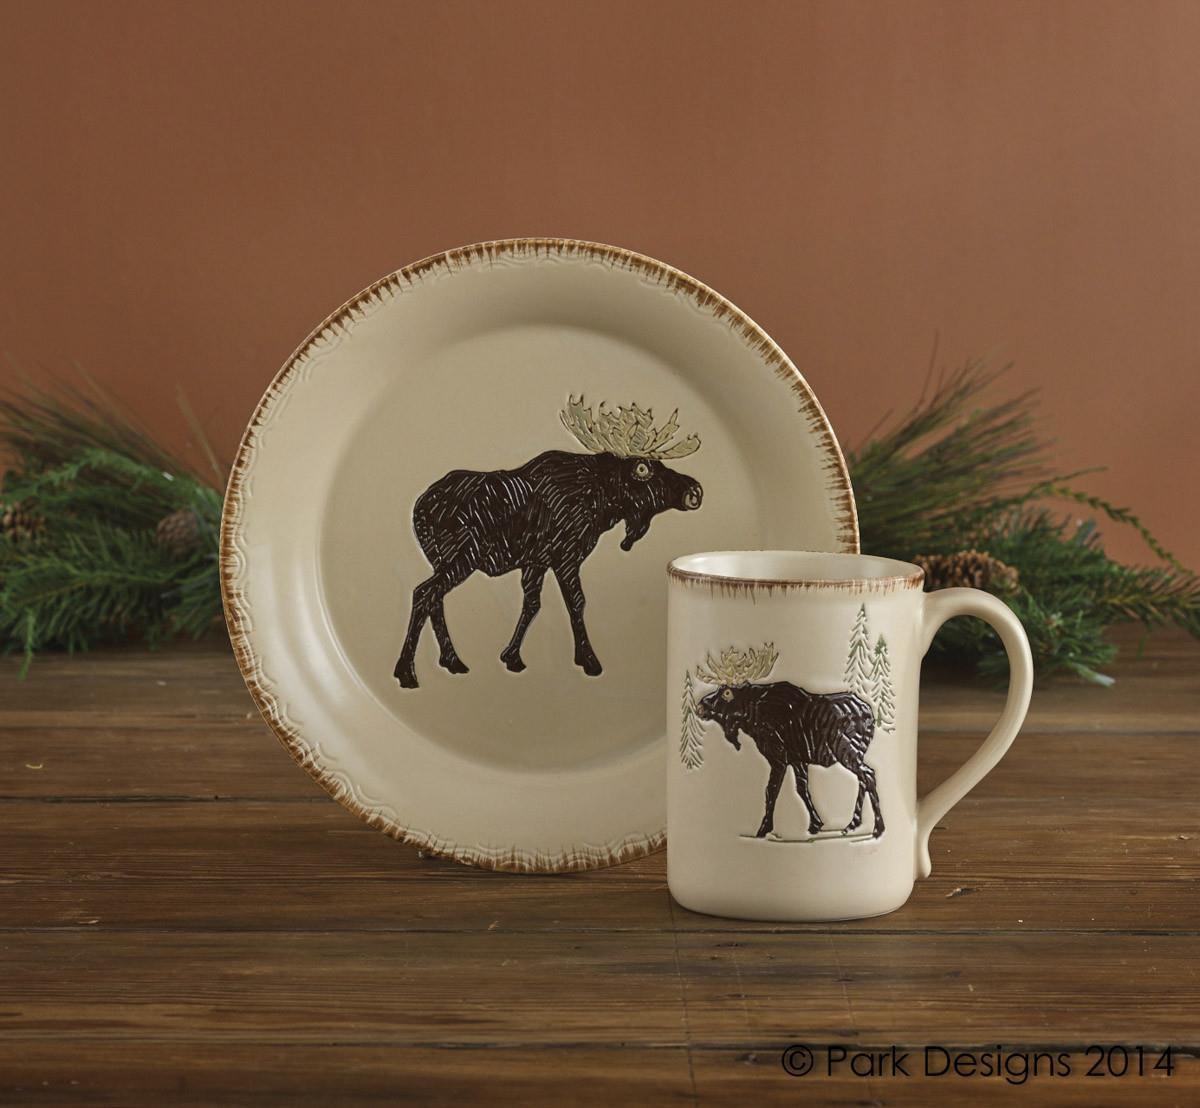 Rustic Retreat Dinnerware Collection -